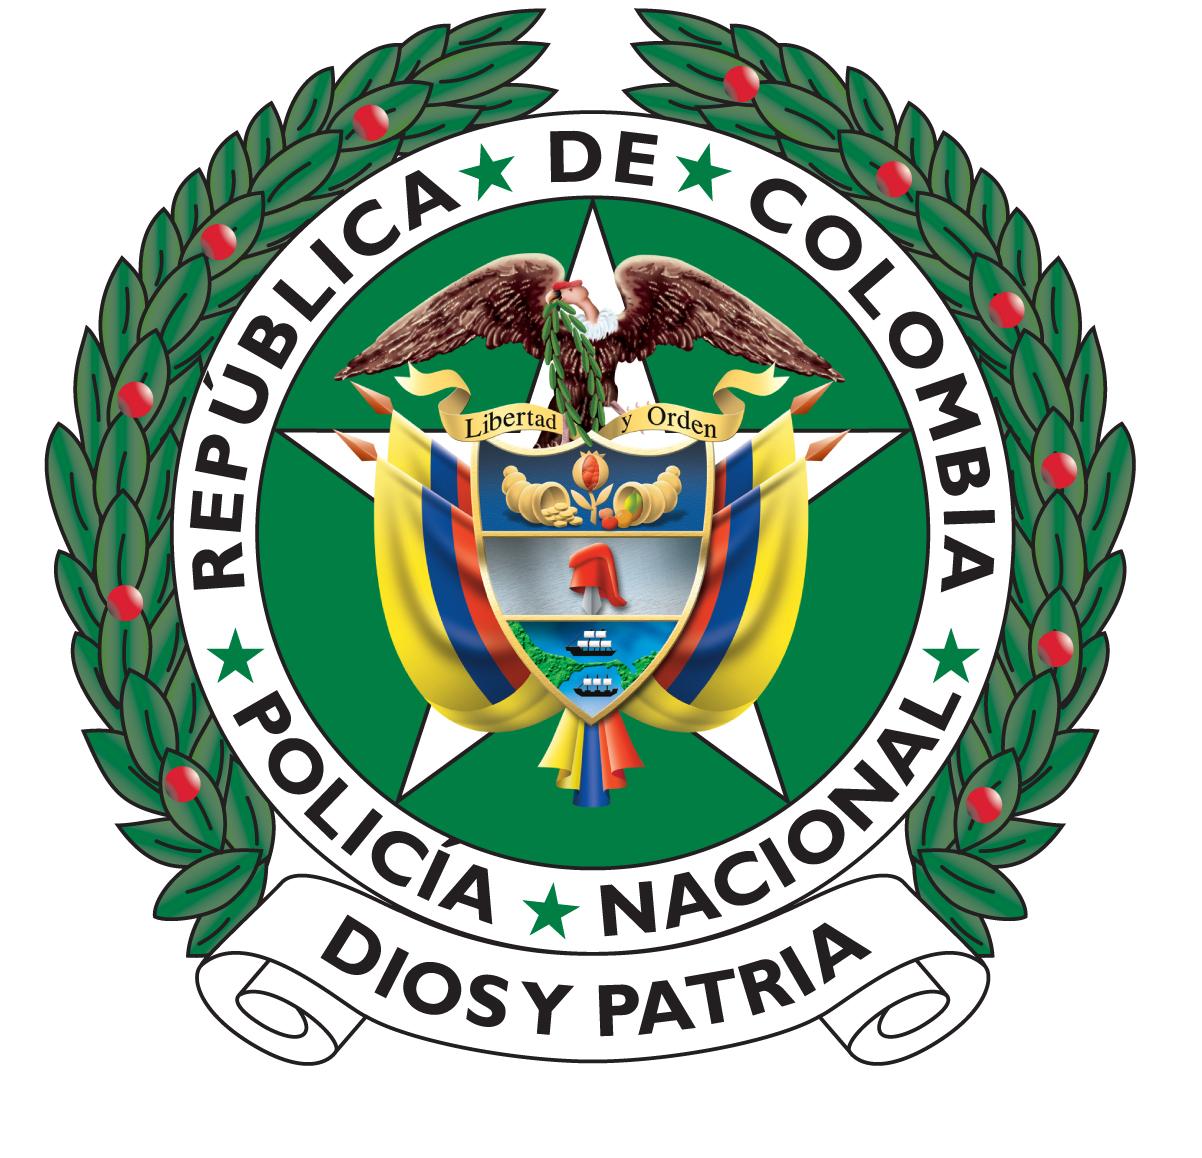 File:Escudo Policía Nacional de Colombia jpg - Wikimedia Commons